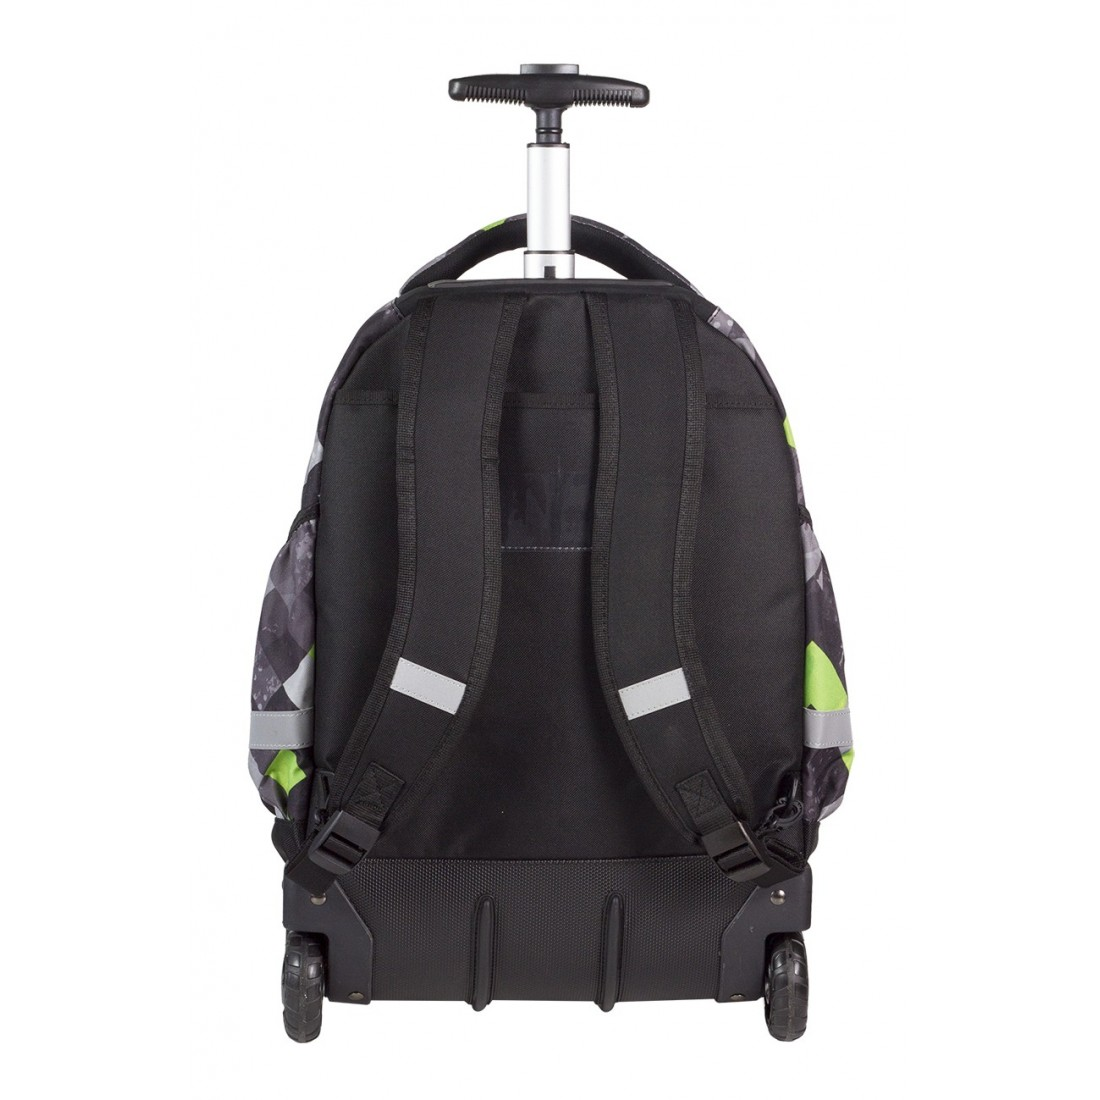 Plecak na kółkach CoolPack CP szary w kratkę RAPID GRUNGE GREY 457 - plecak-tornister.pl